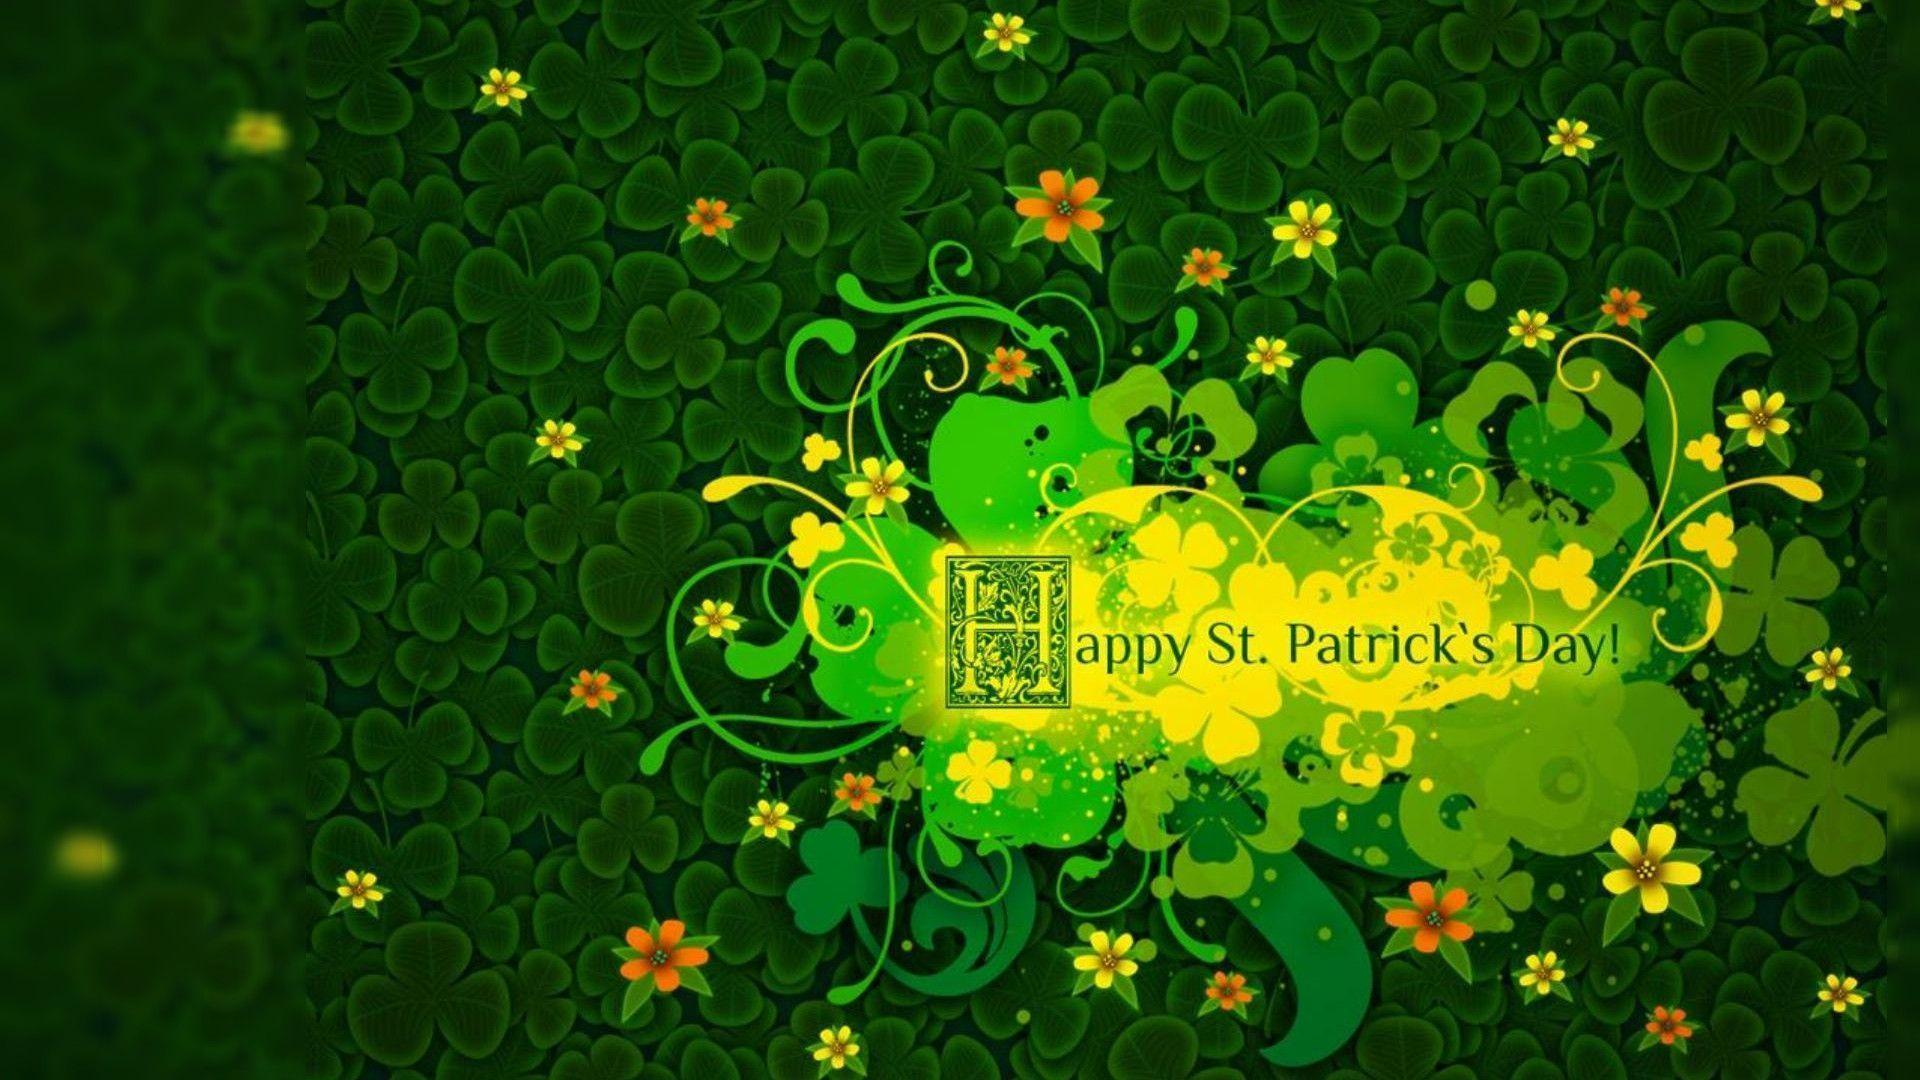 St Patricks Day Desktop Wallpaper 40632 Hd Wallpapers Background